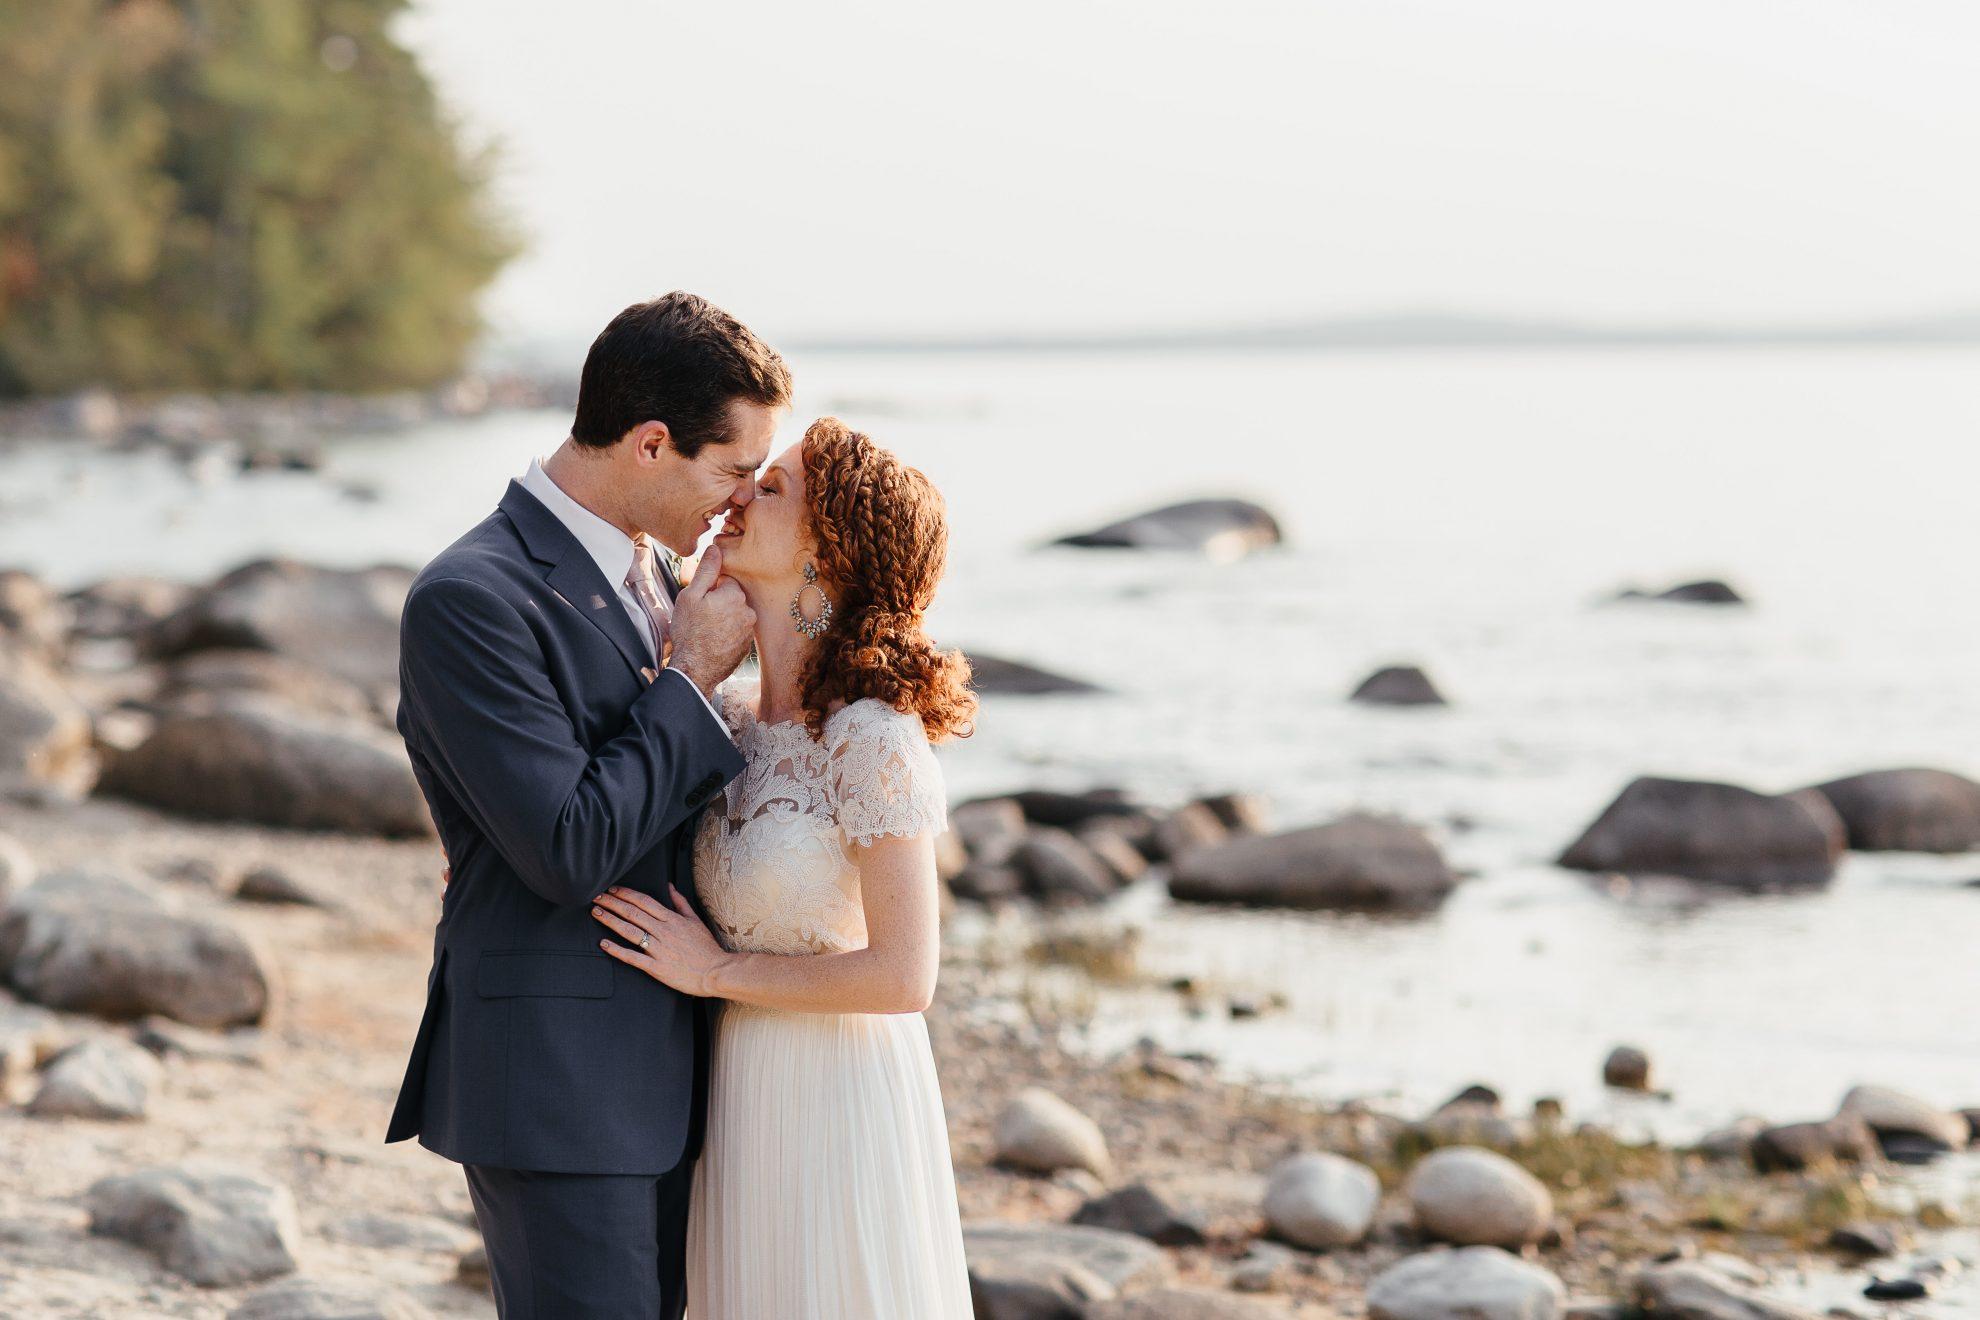 Stonebarn_Maine_Wedding-1-origina